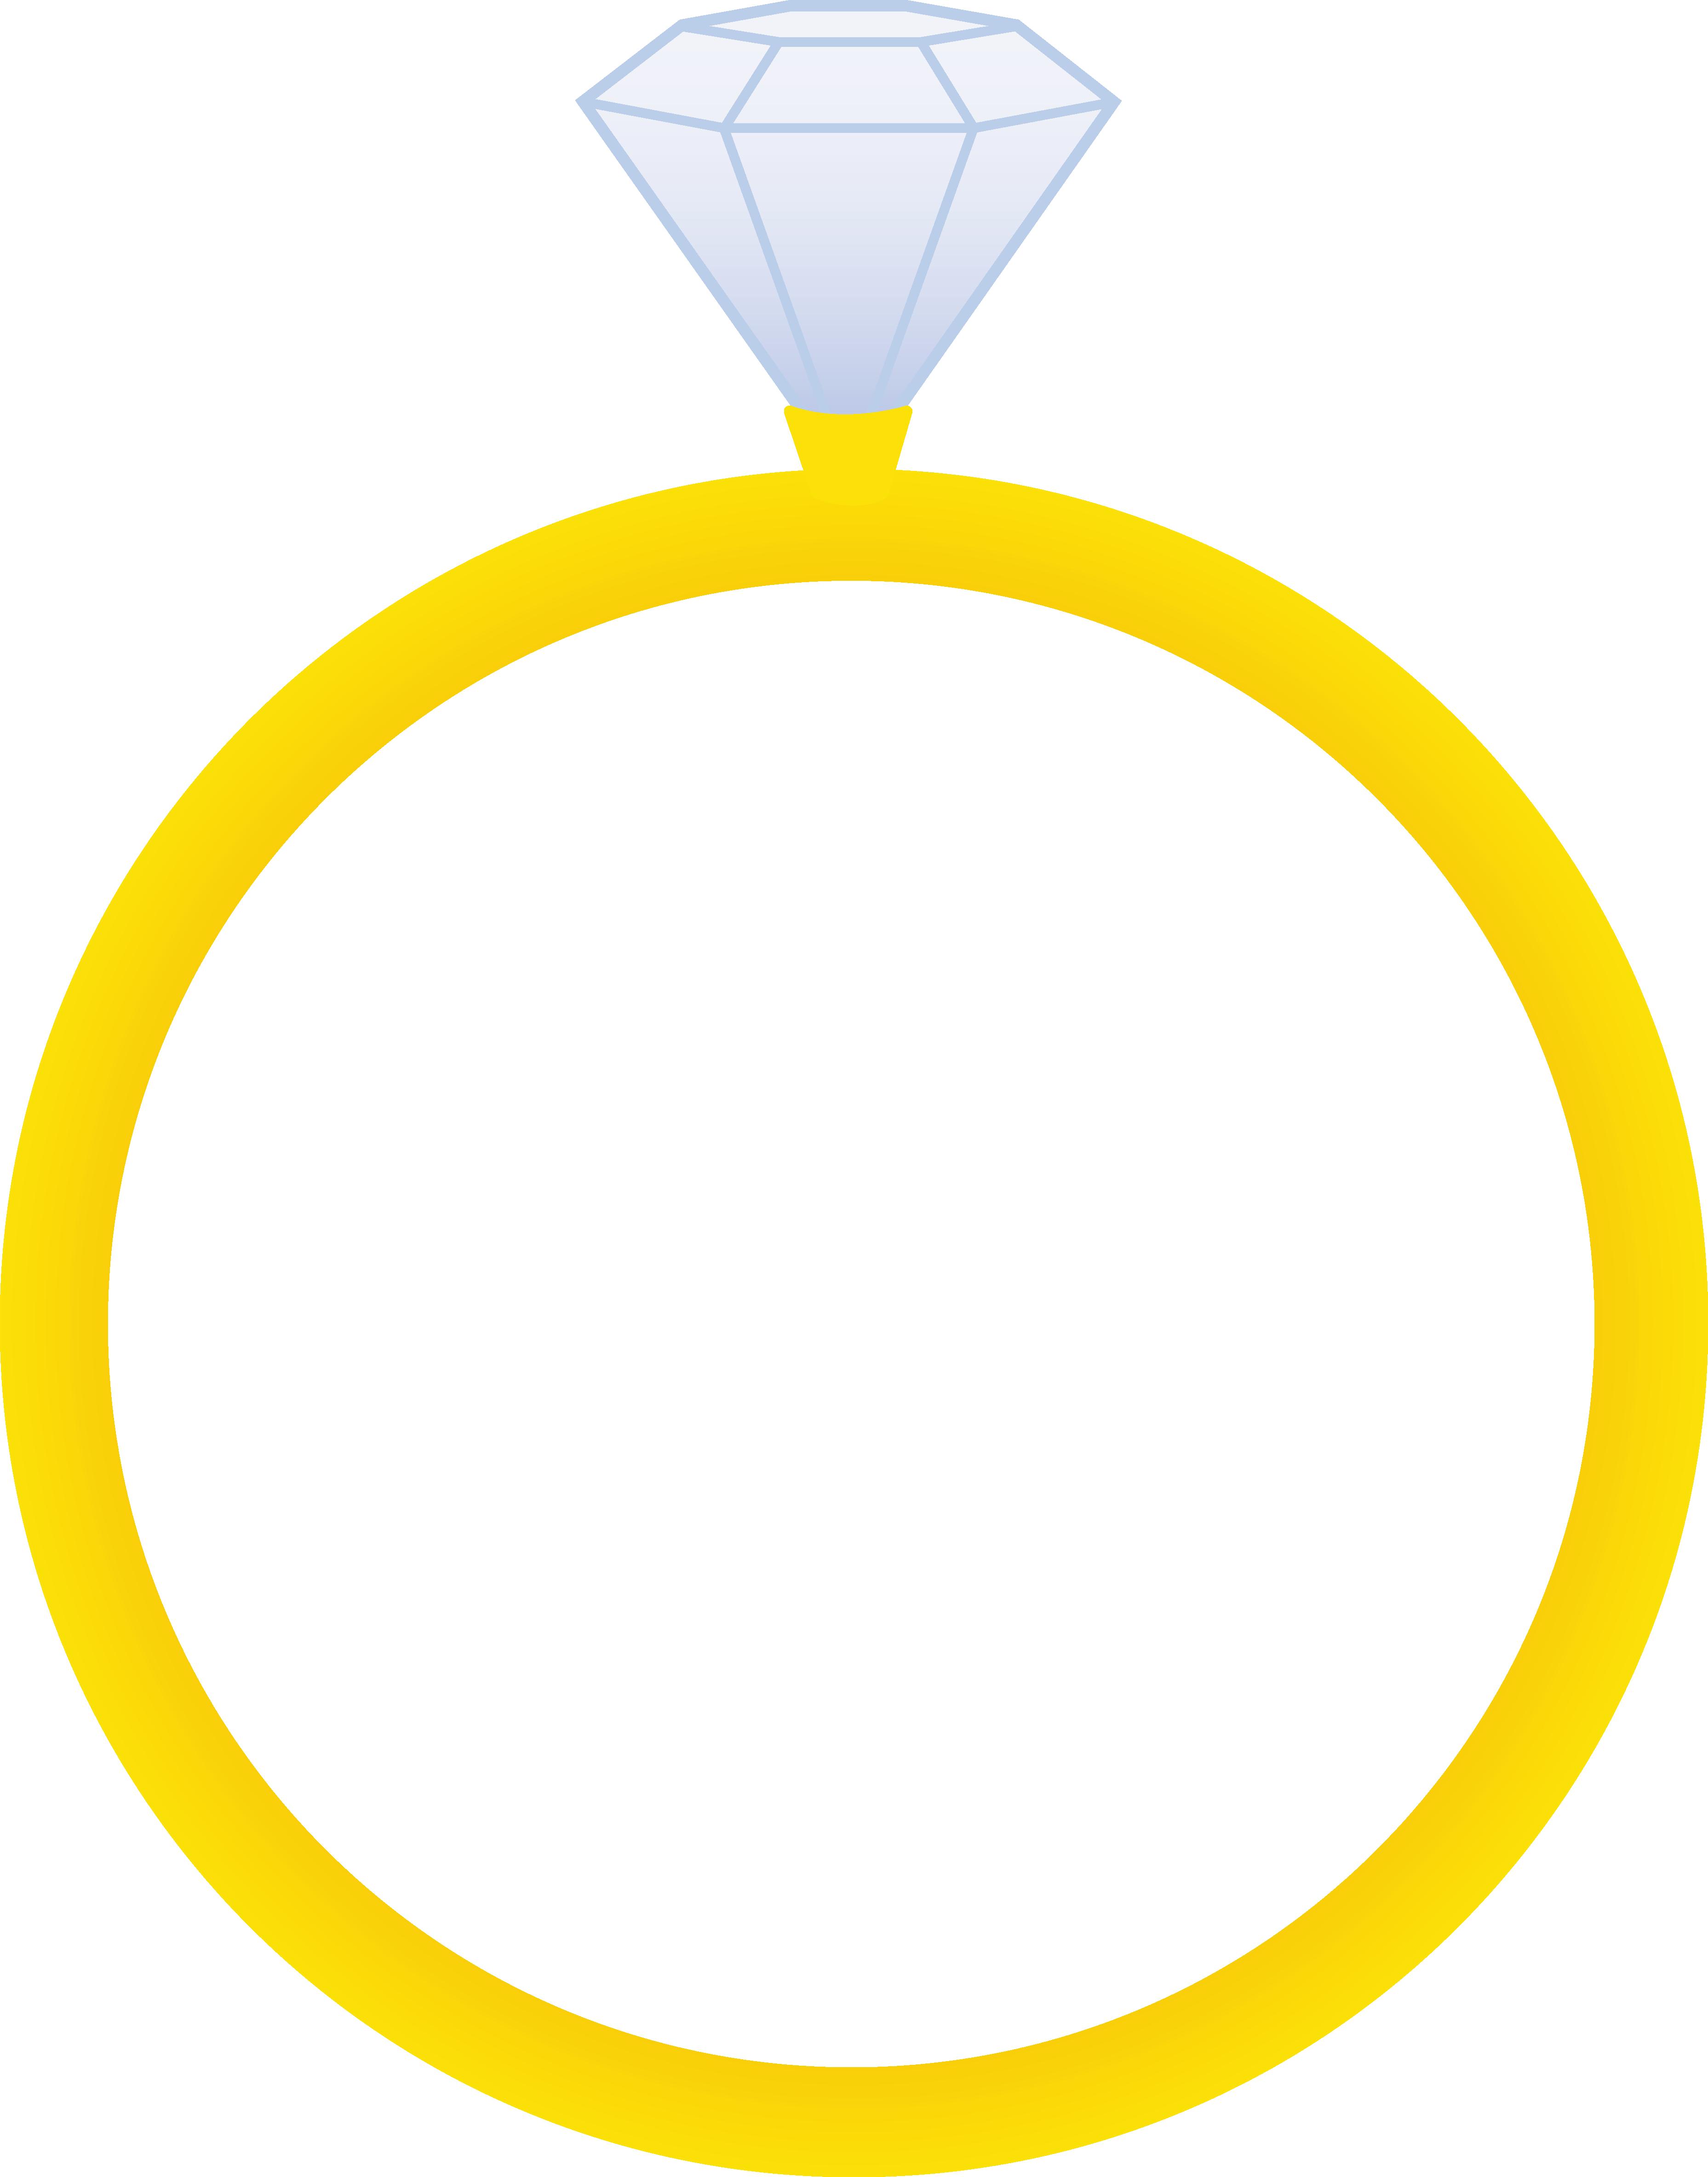 Diamond Wedding Ring Clipart.